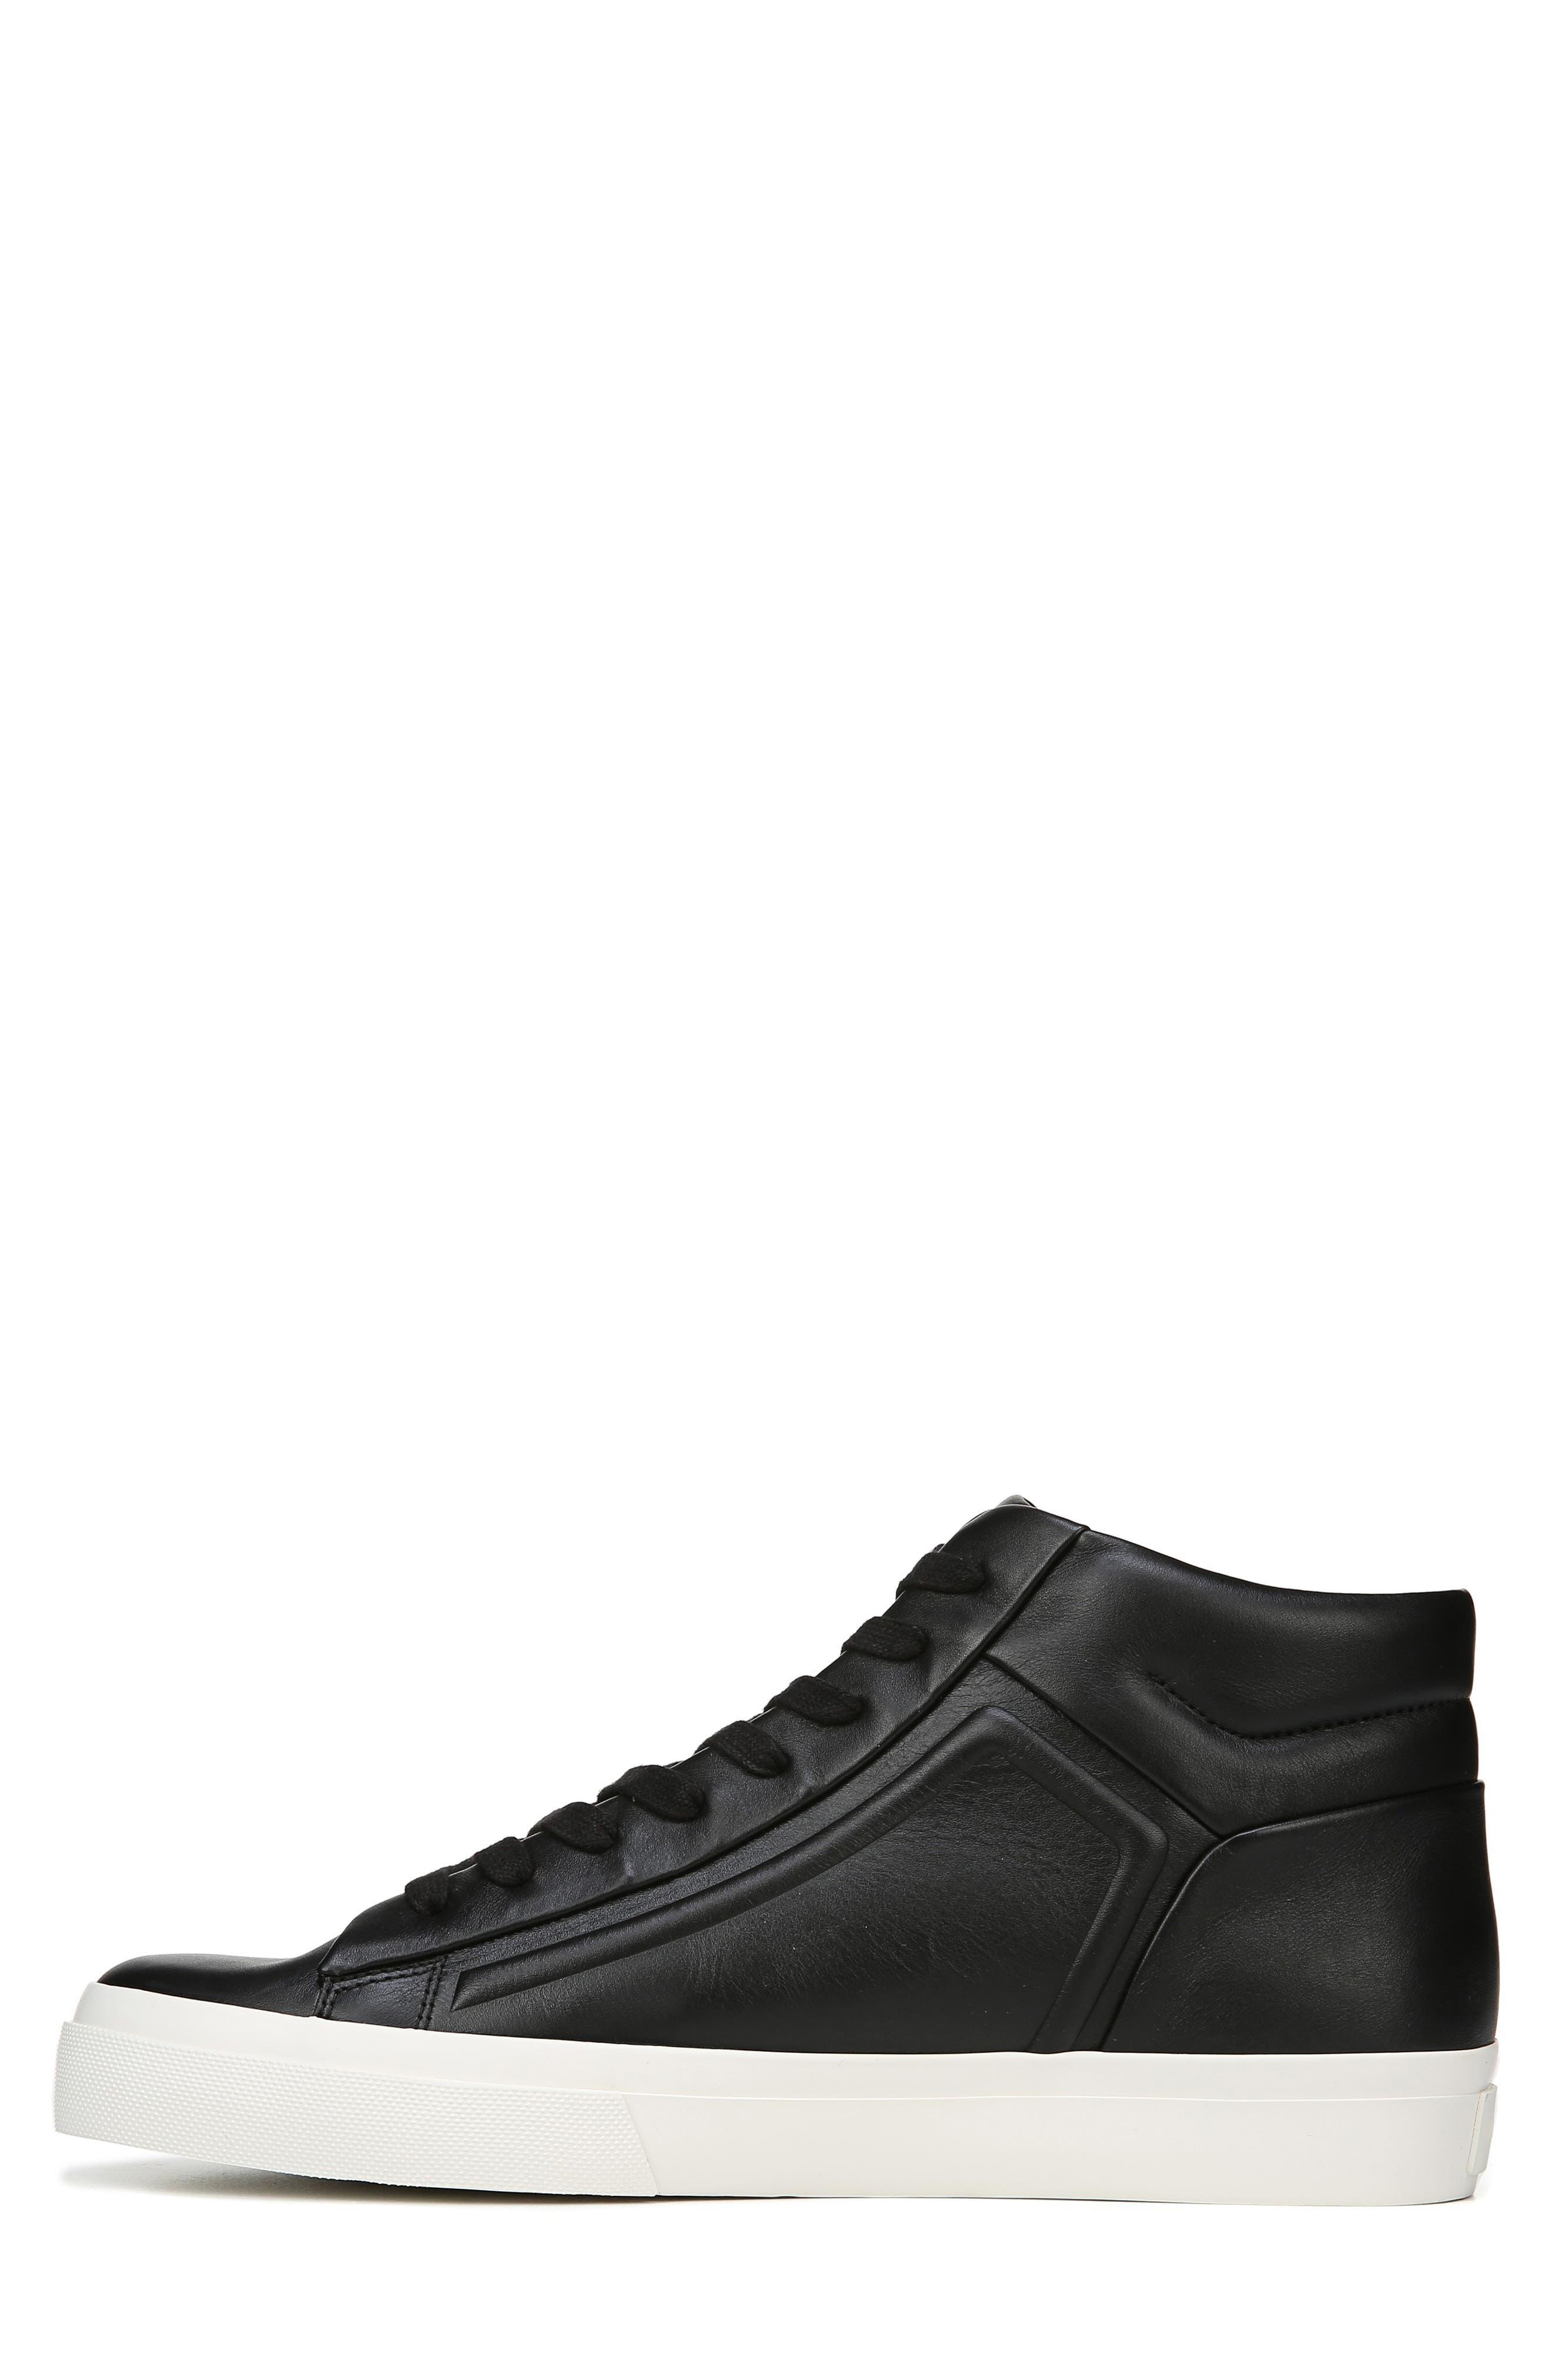 VINCE, Fynn High Top Sneaker, Alternate thumbnail 9, color, BLACK